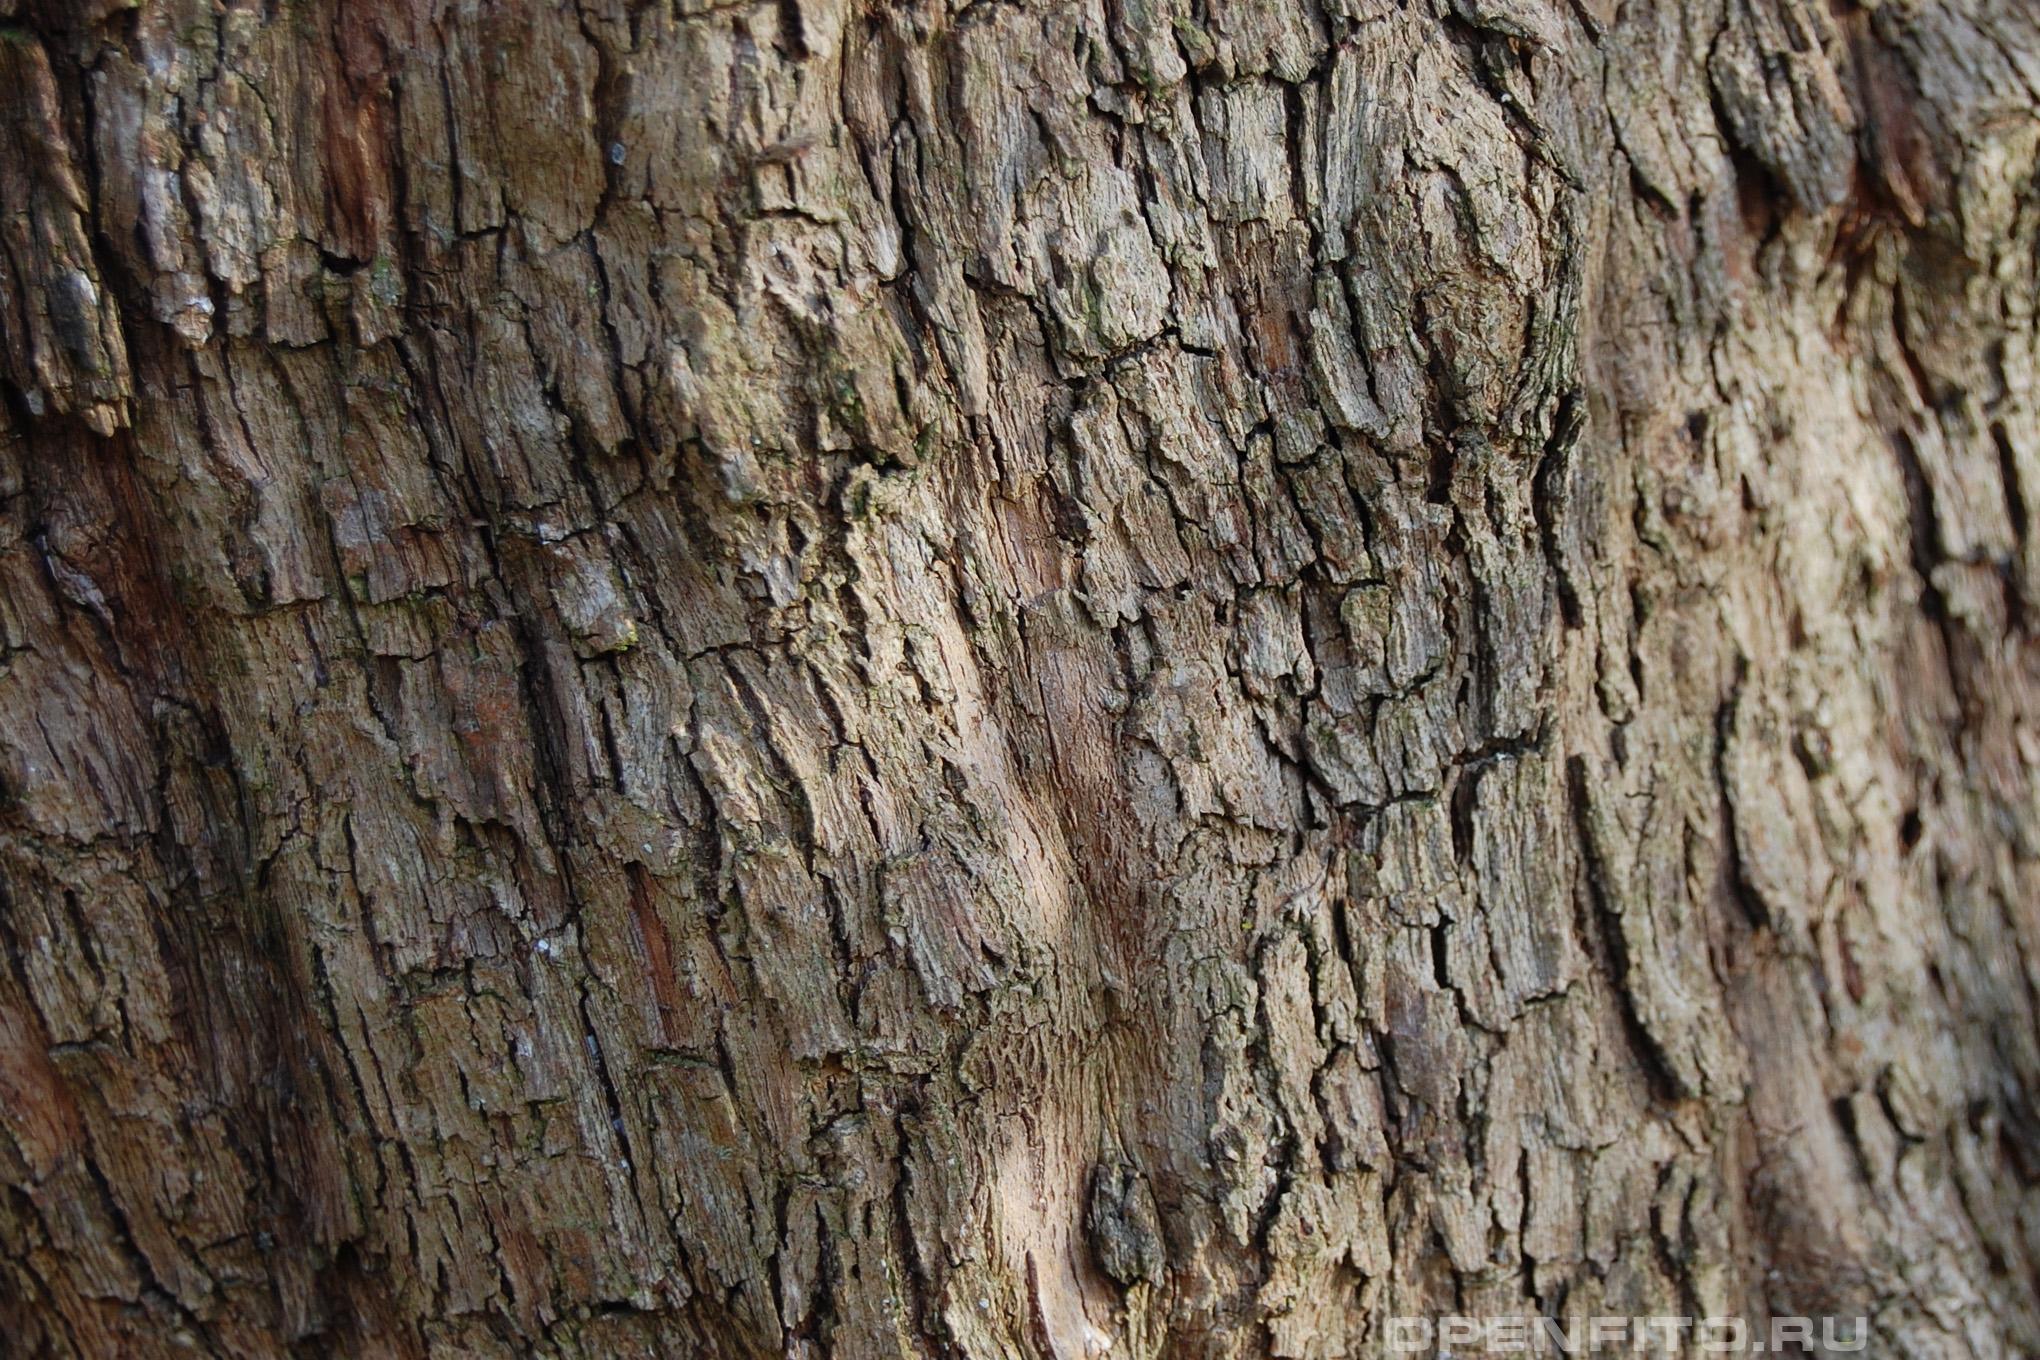 Кизил лекарственный кора дерева